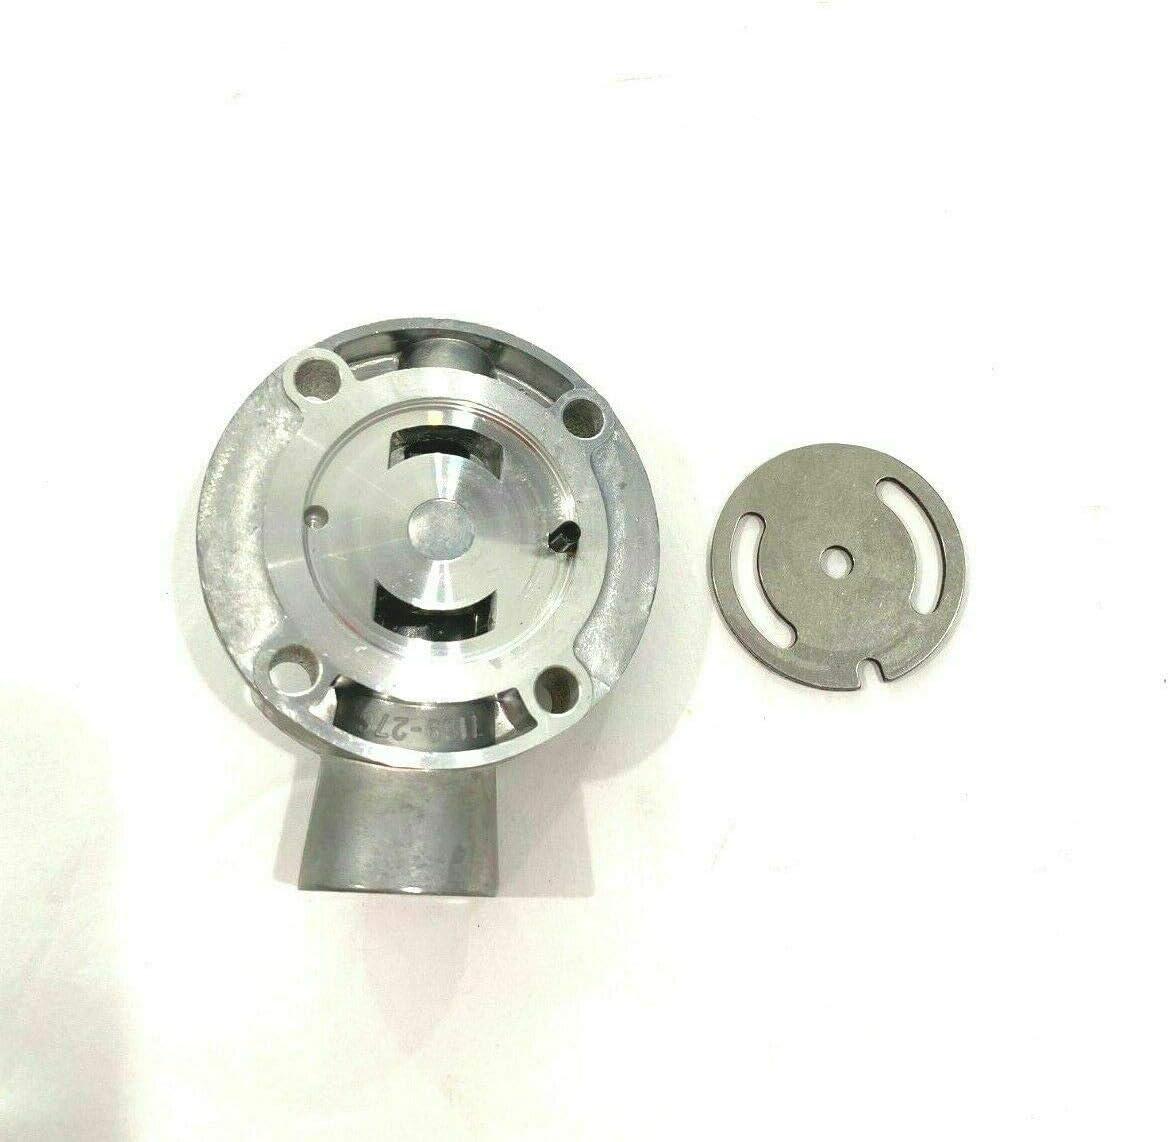 For Delphi Lucas CAV DPA Overhaul Rebuild Gasket Kit End Plate Blade Liner Cover